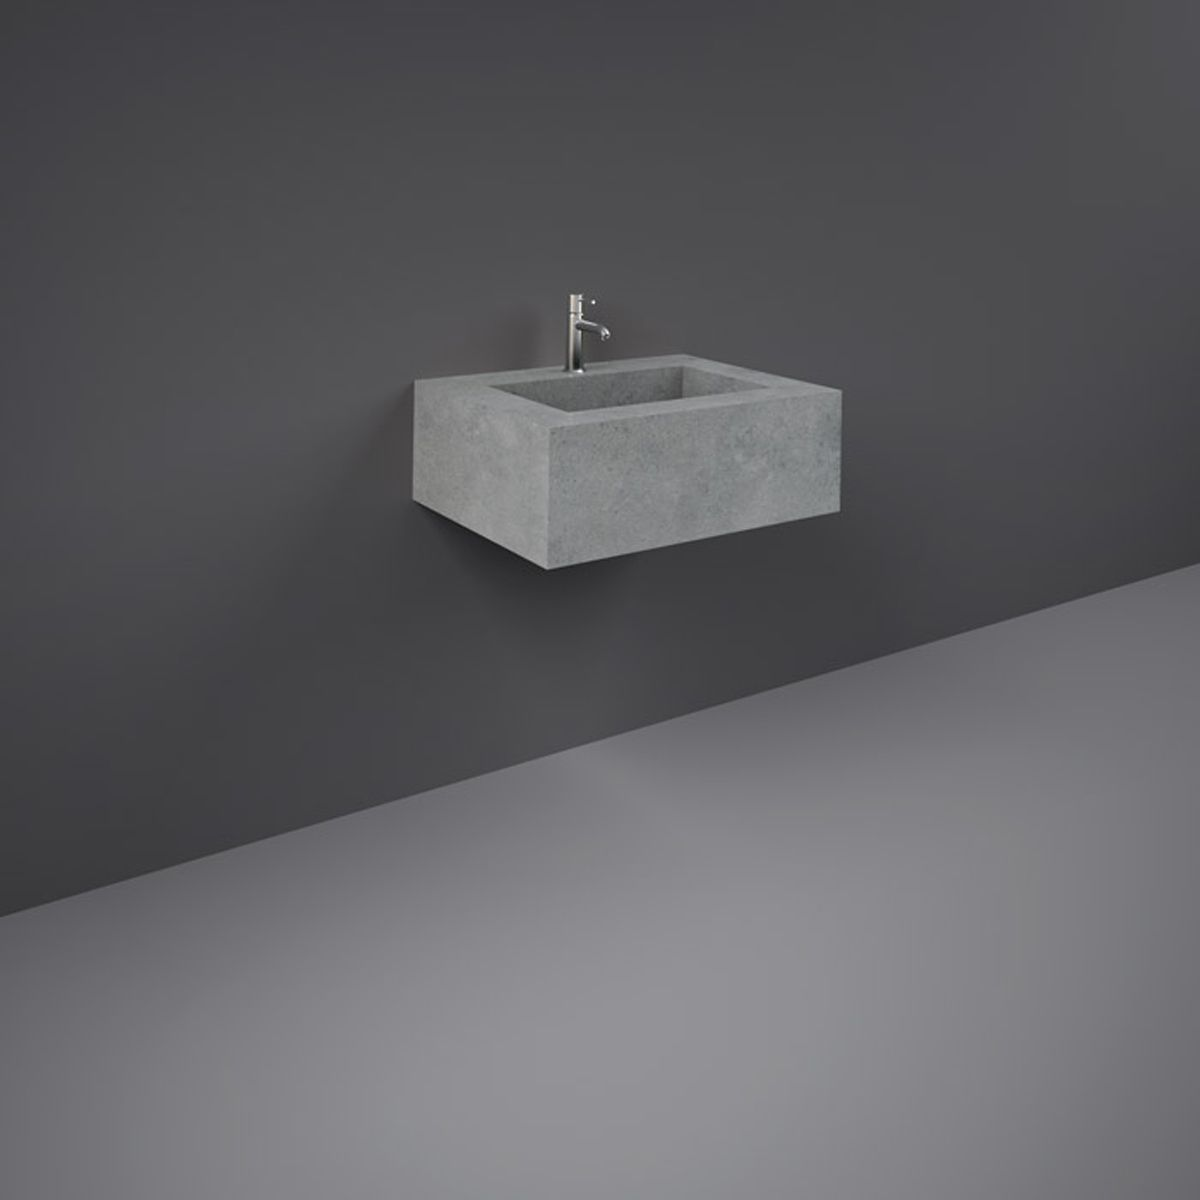 RAK Precious Surface Cool Grey Wall Hung Counter Basin with Bracket